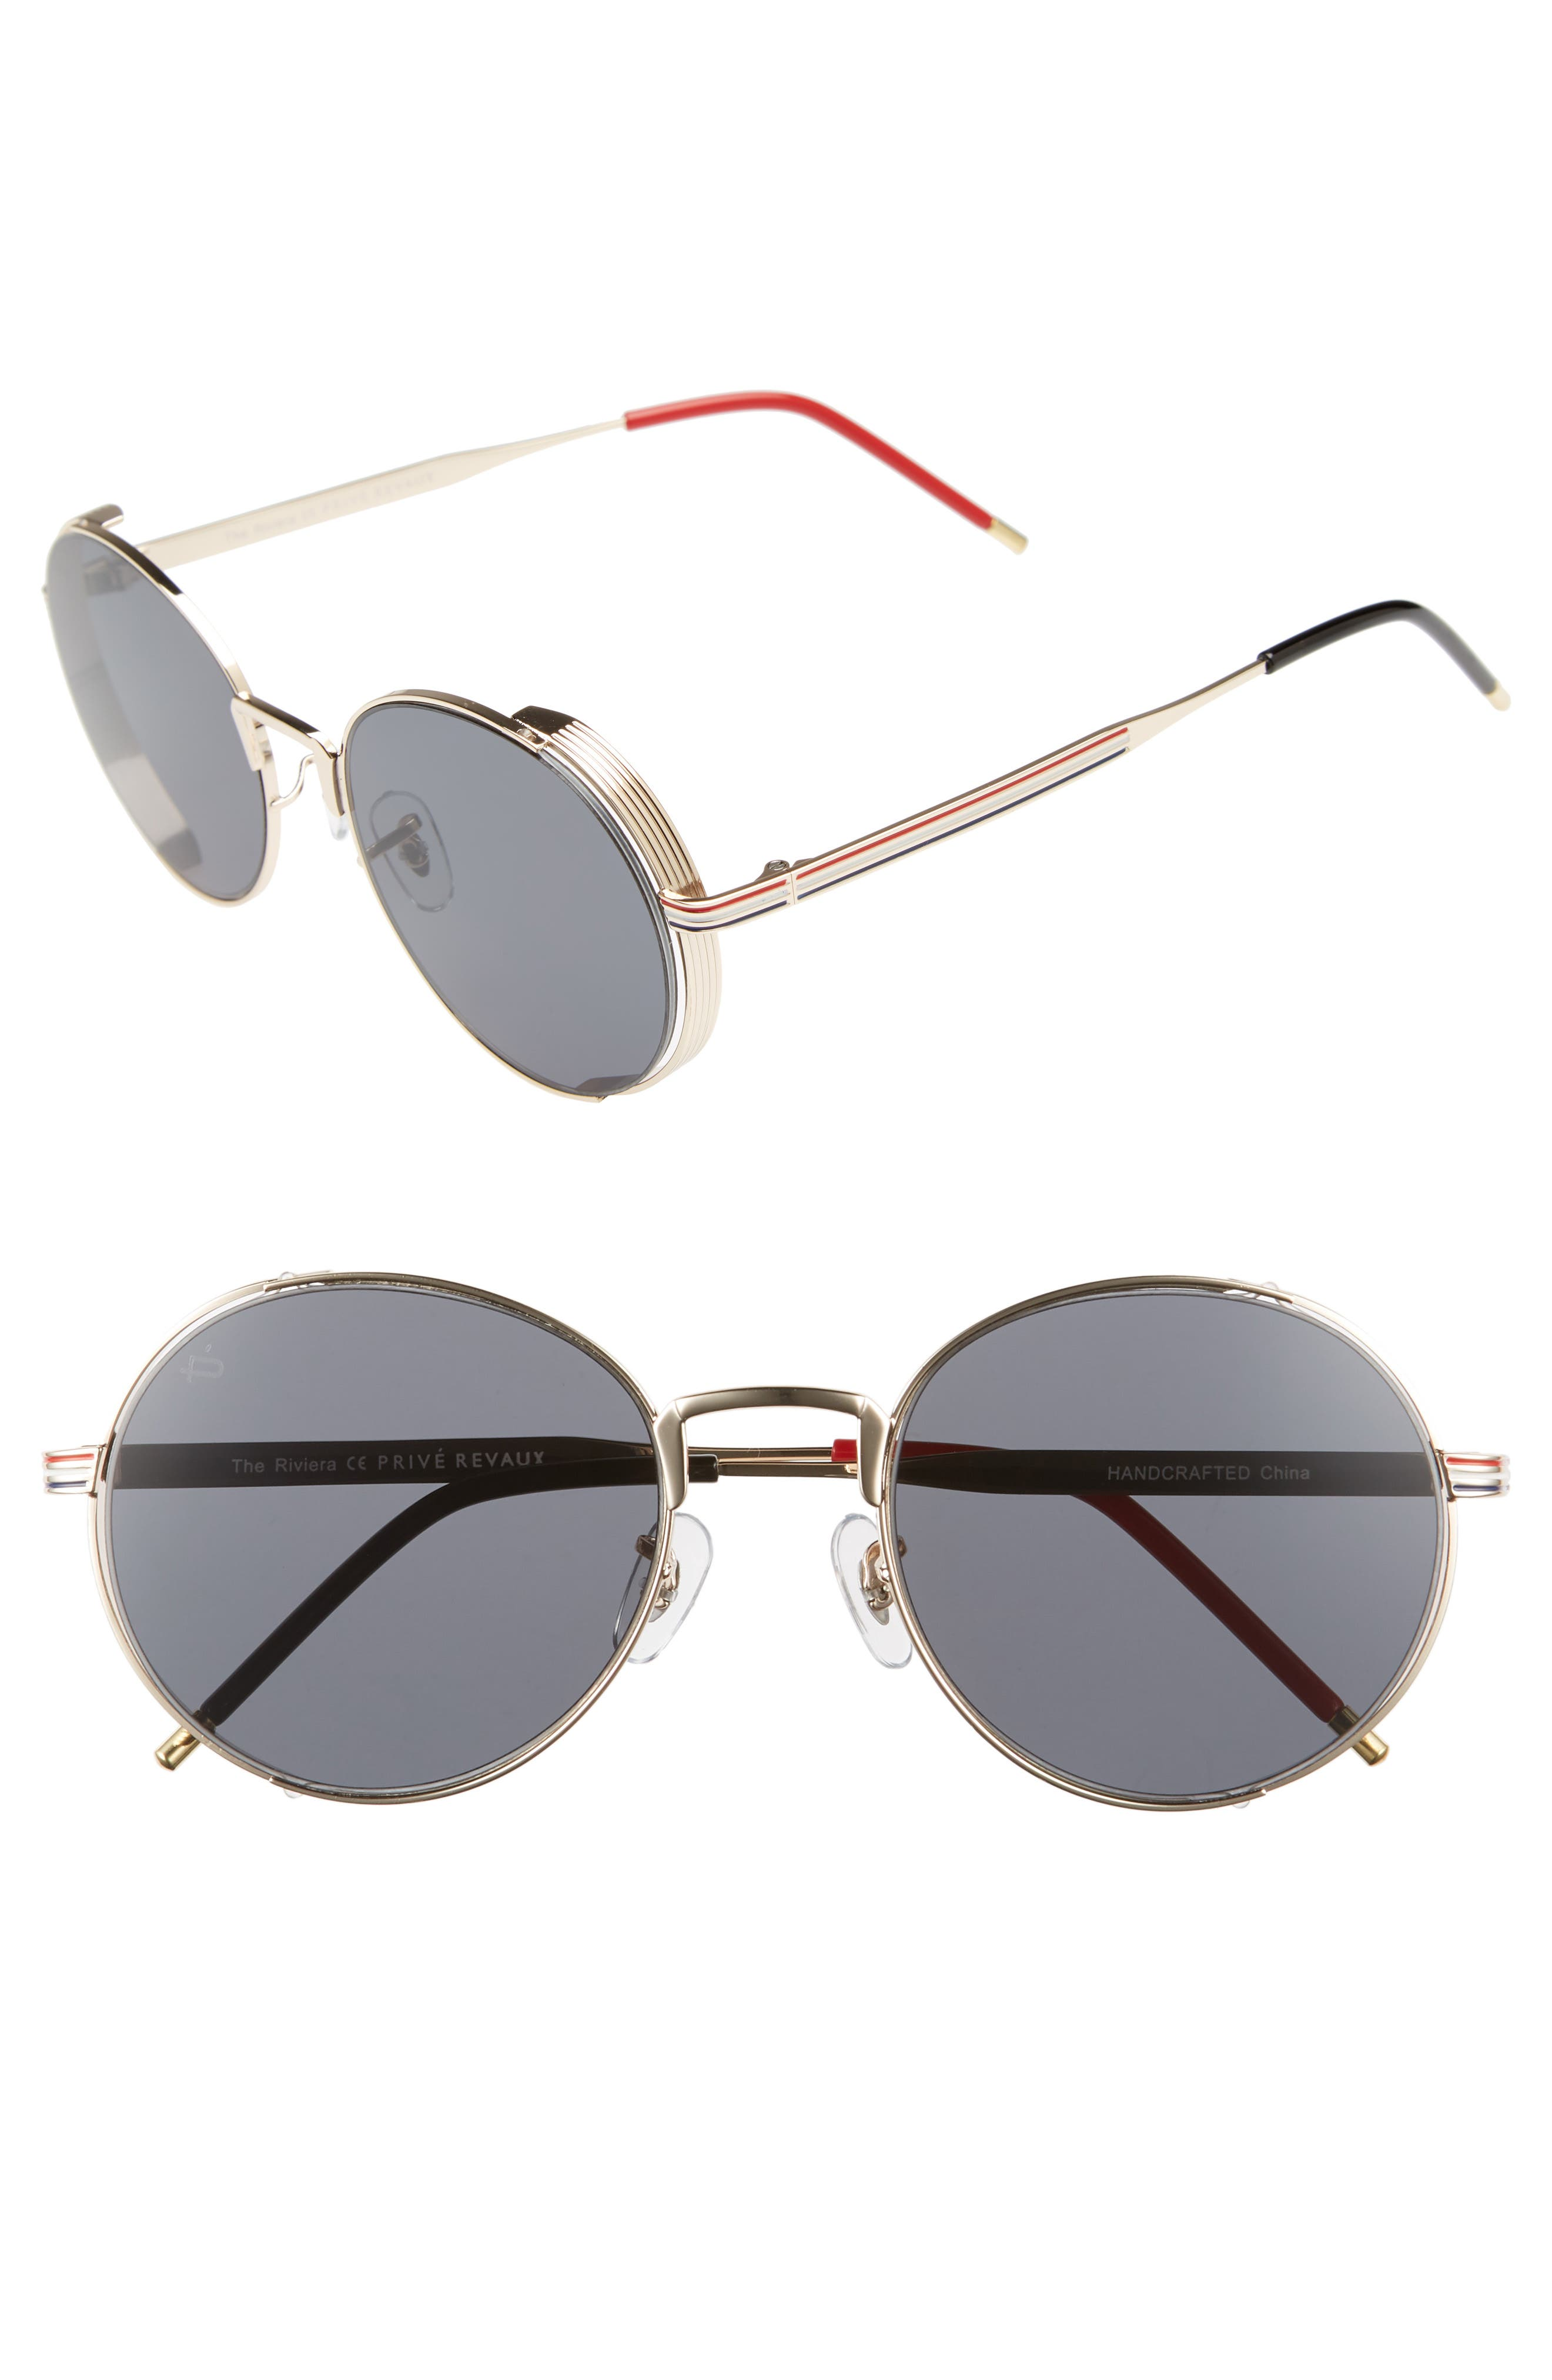 Privé Revaux The Riviera Round Sunglasses,                         Main,                         color, 020